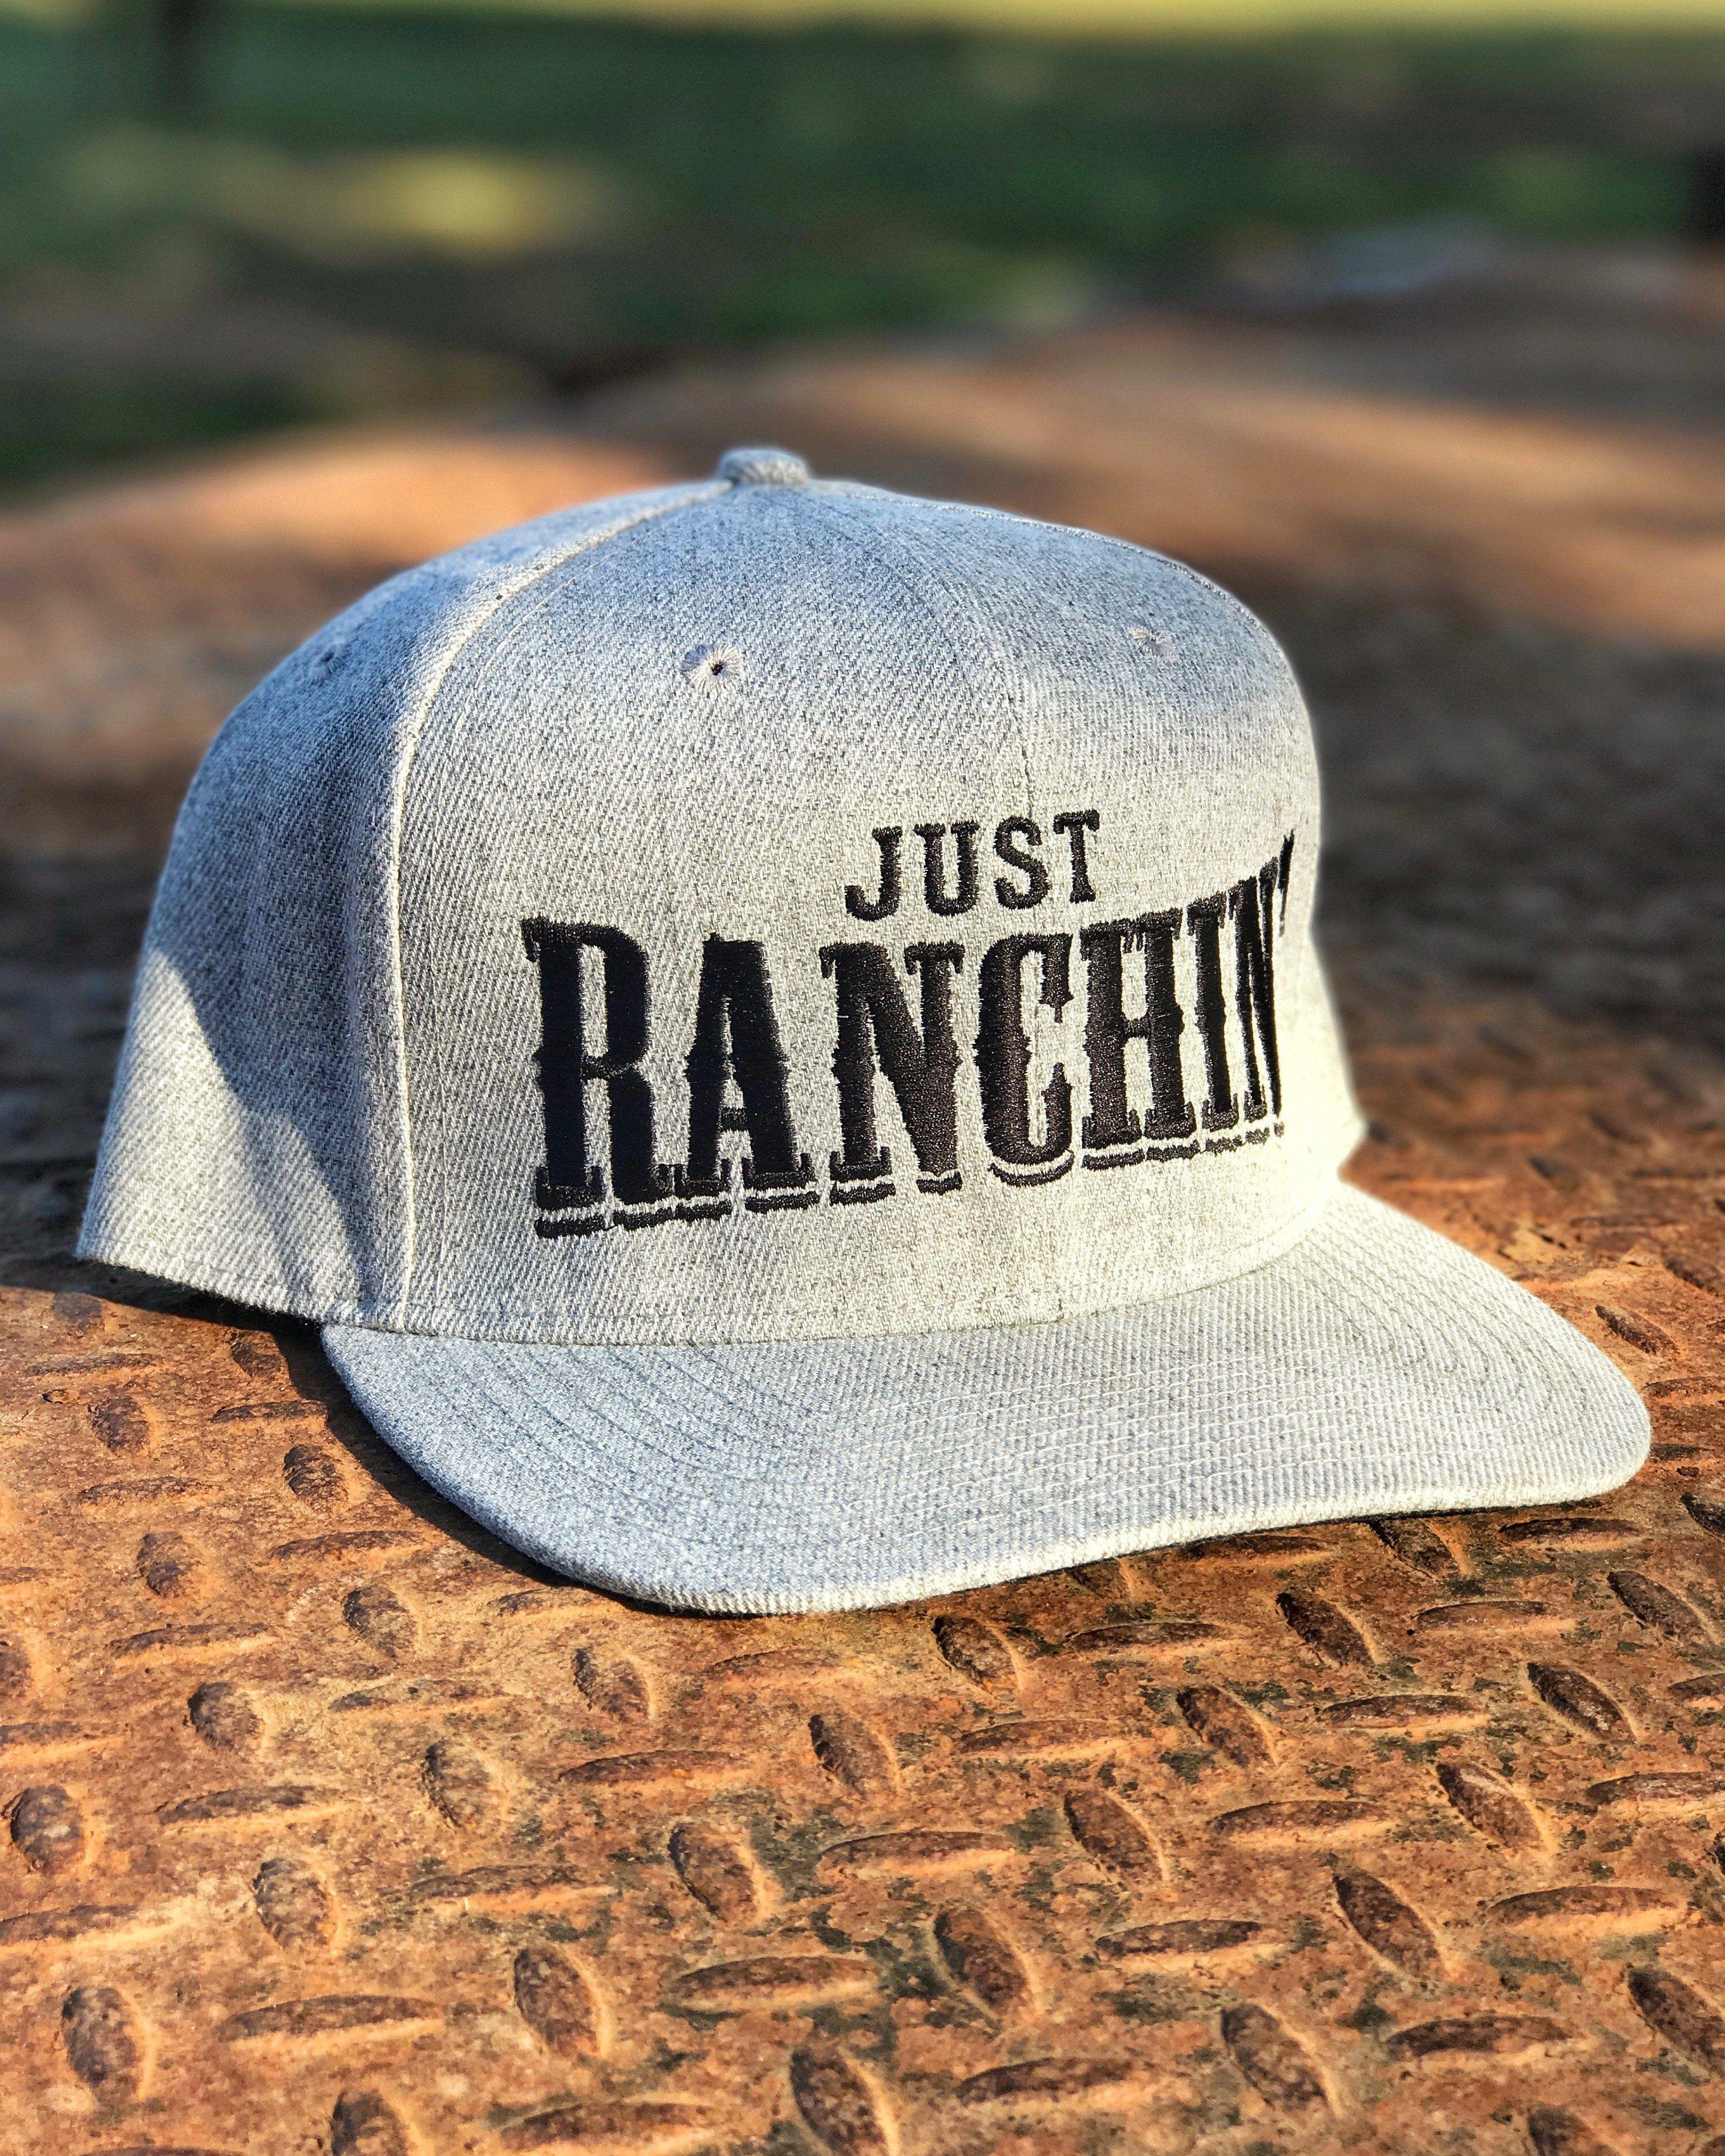 0dafc055da62 Just Ranchin Heather Grey Snapback Cowgirl Hats